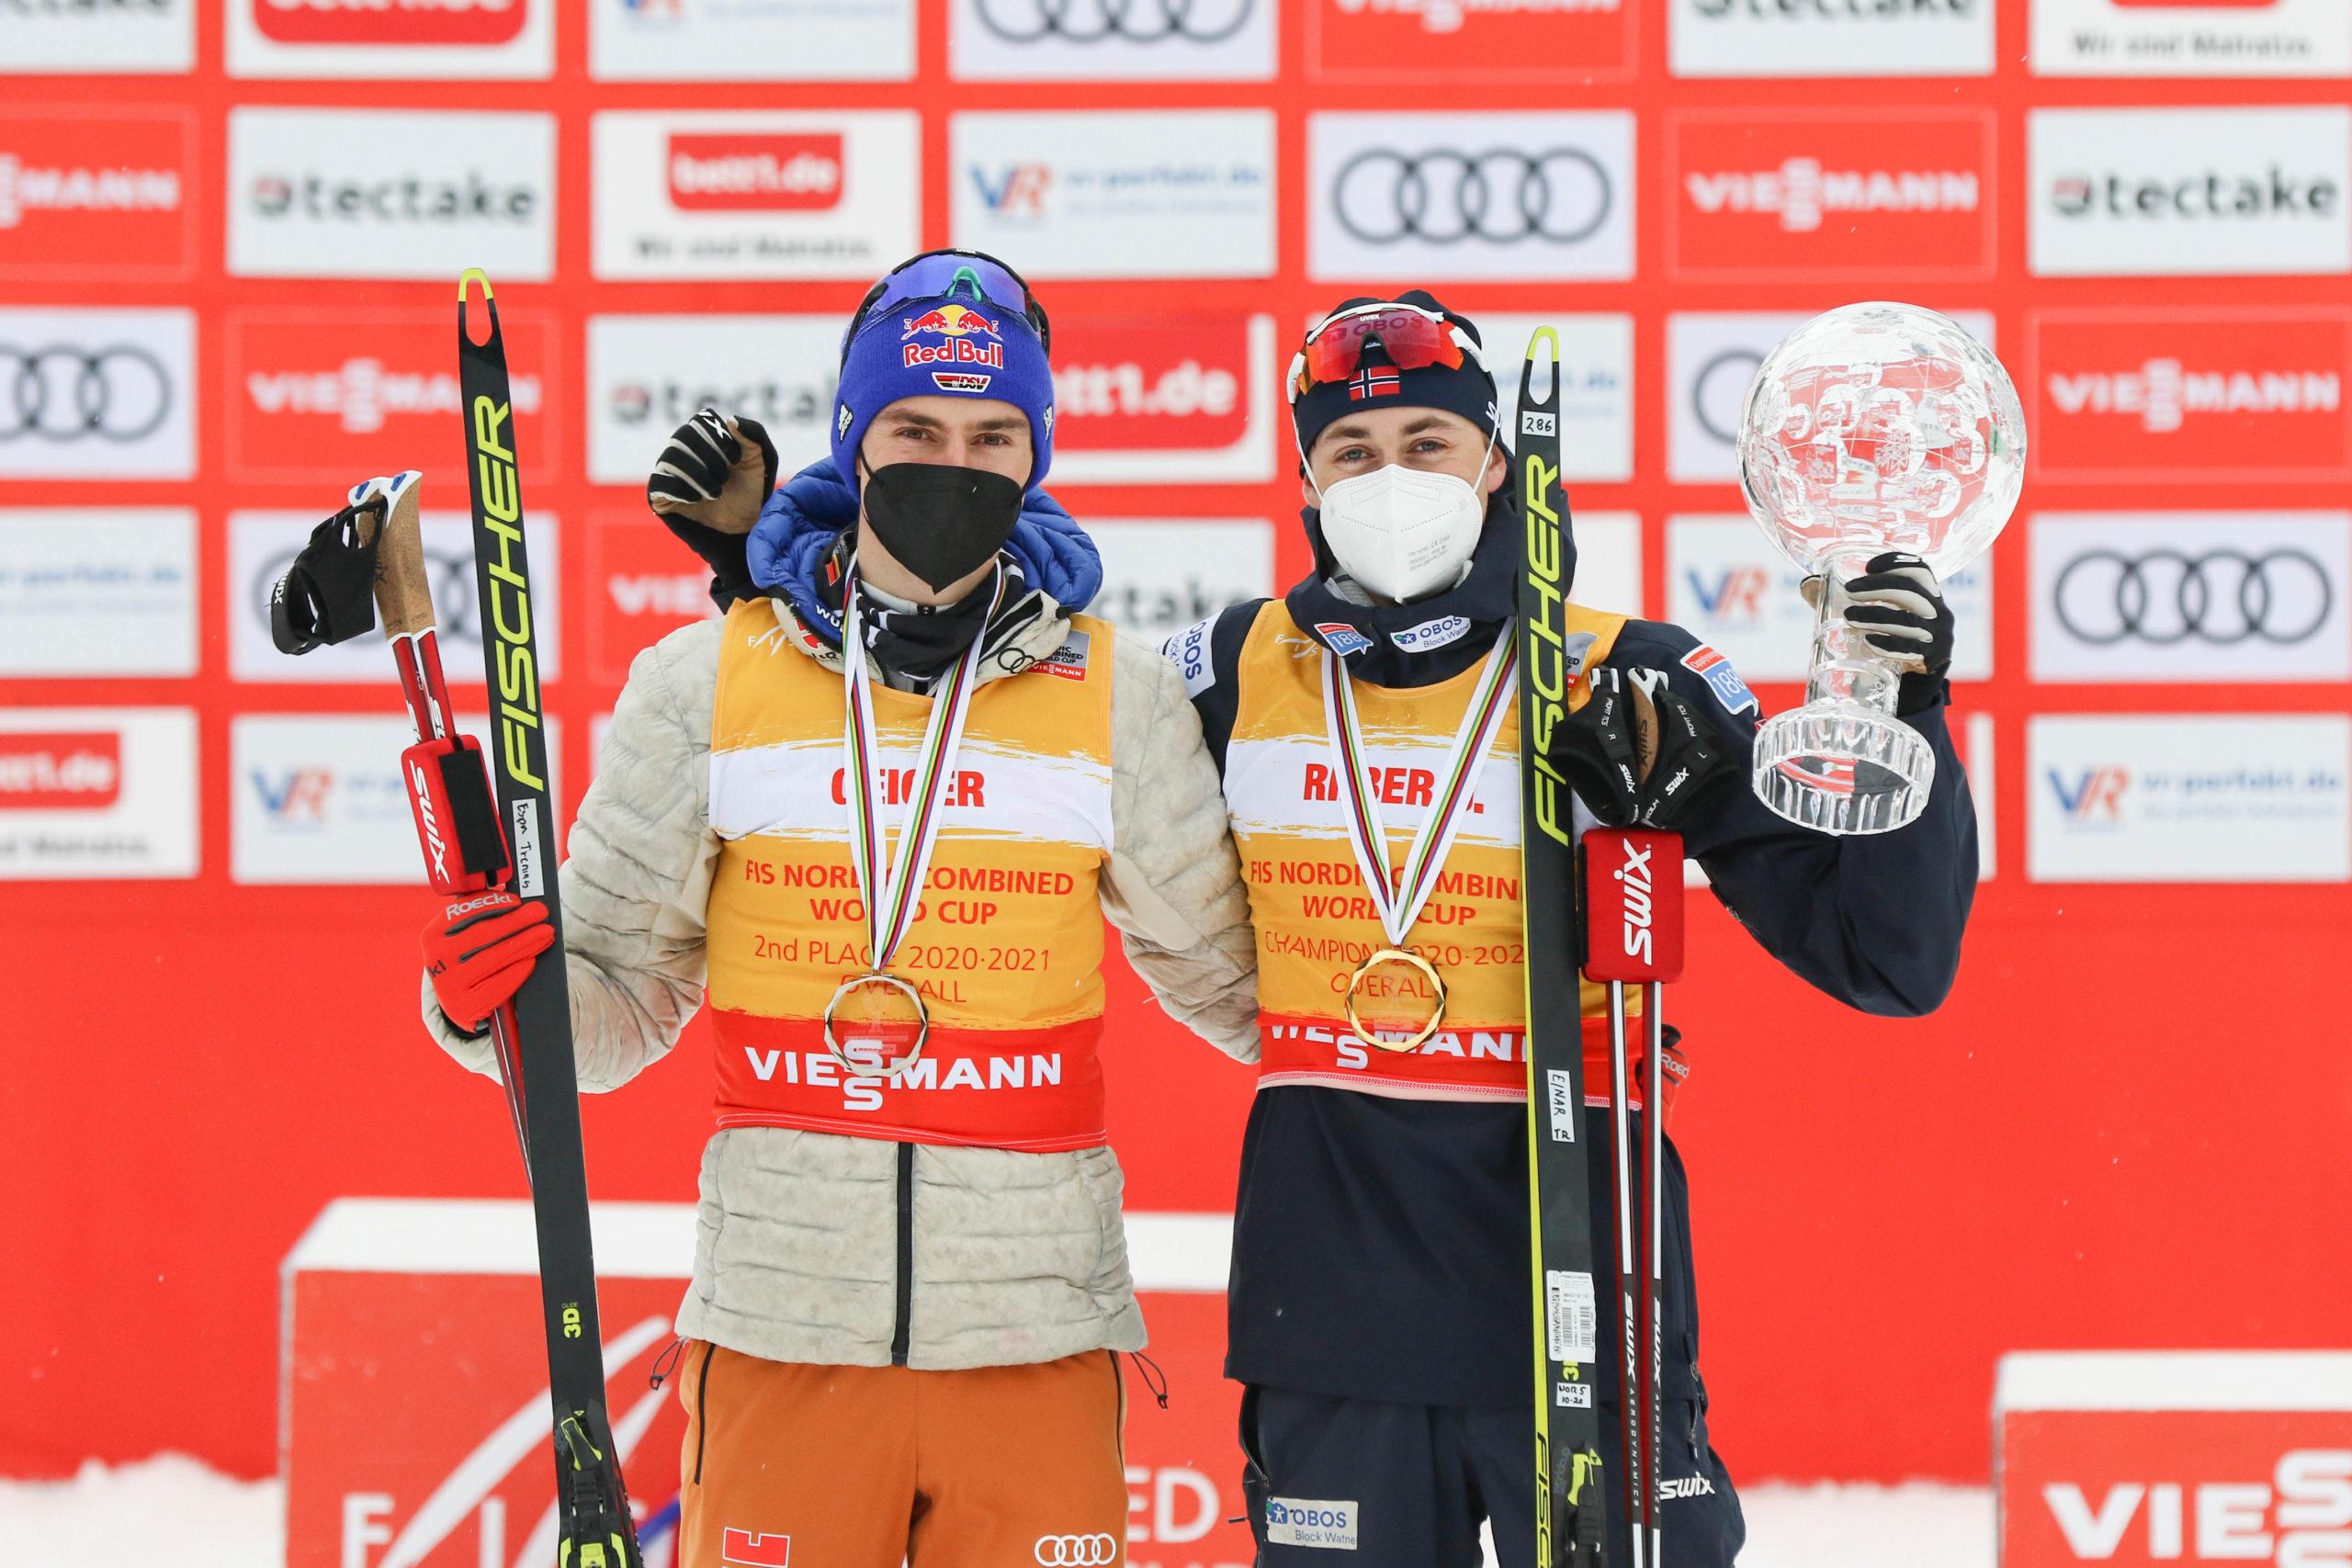 Kombinierer Riiber auch in Klingenthal Weltcup-Dominator